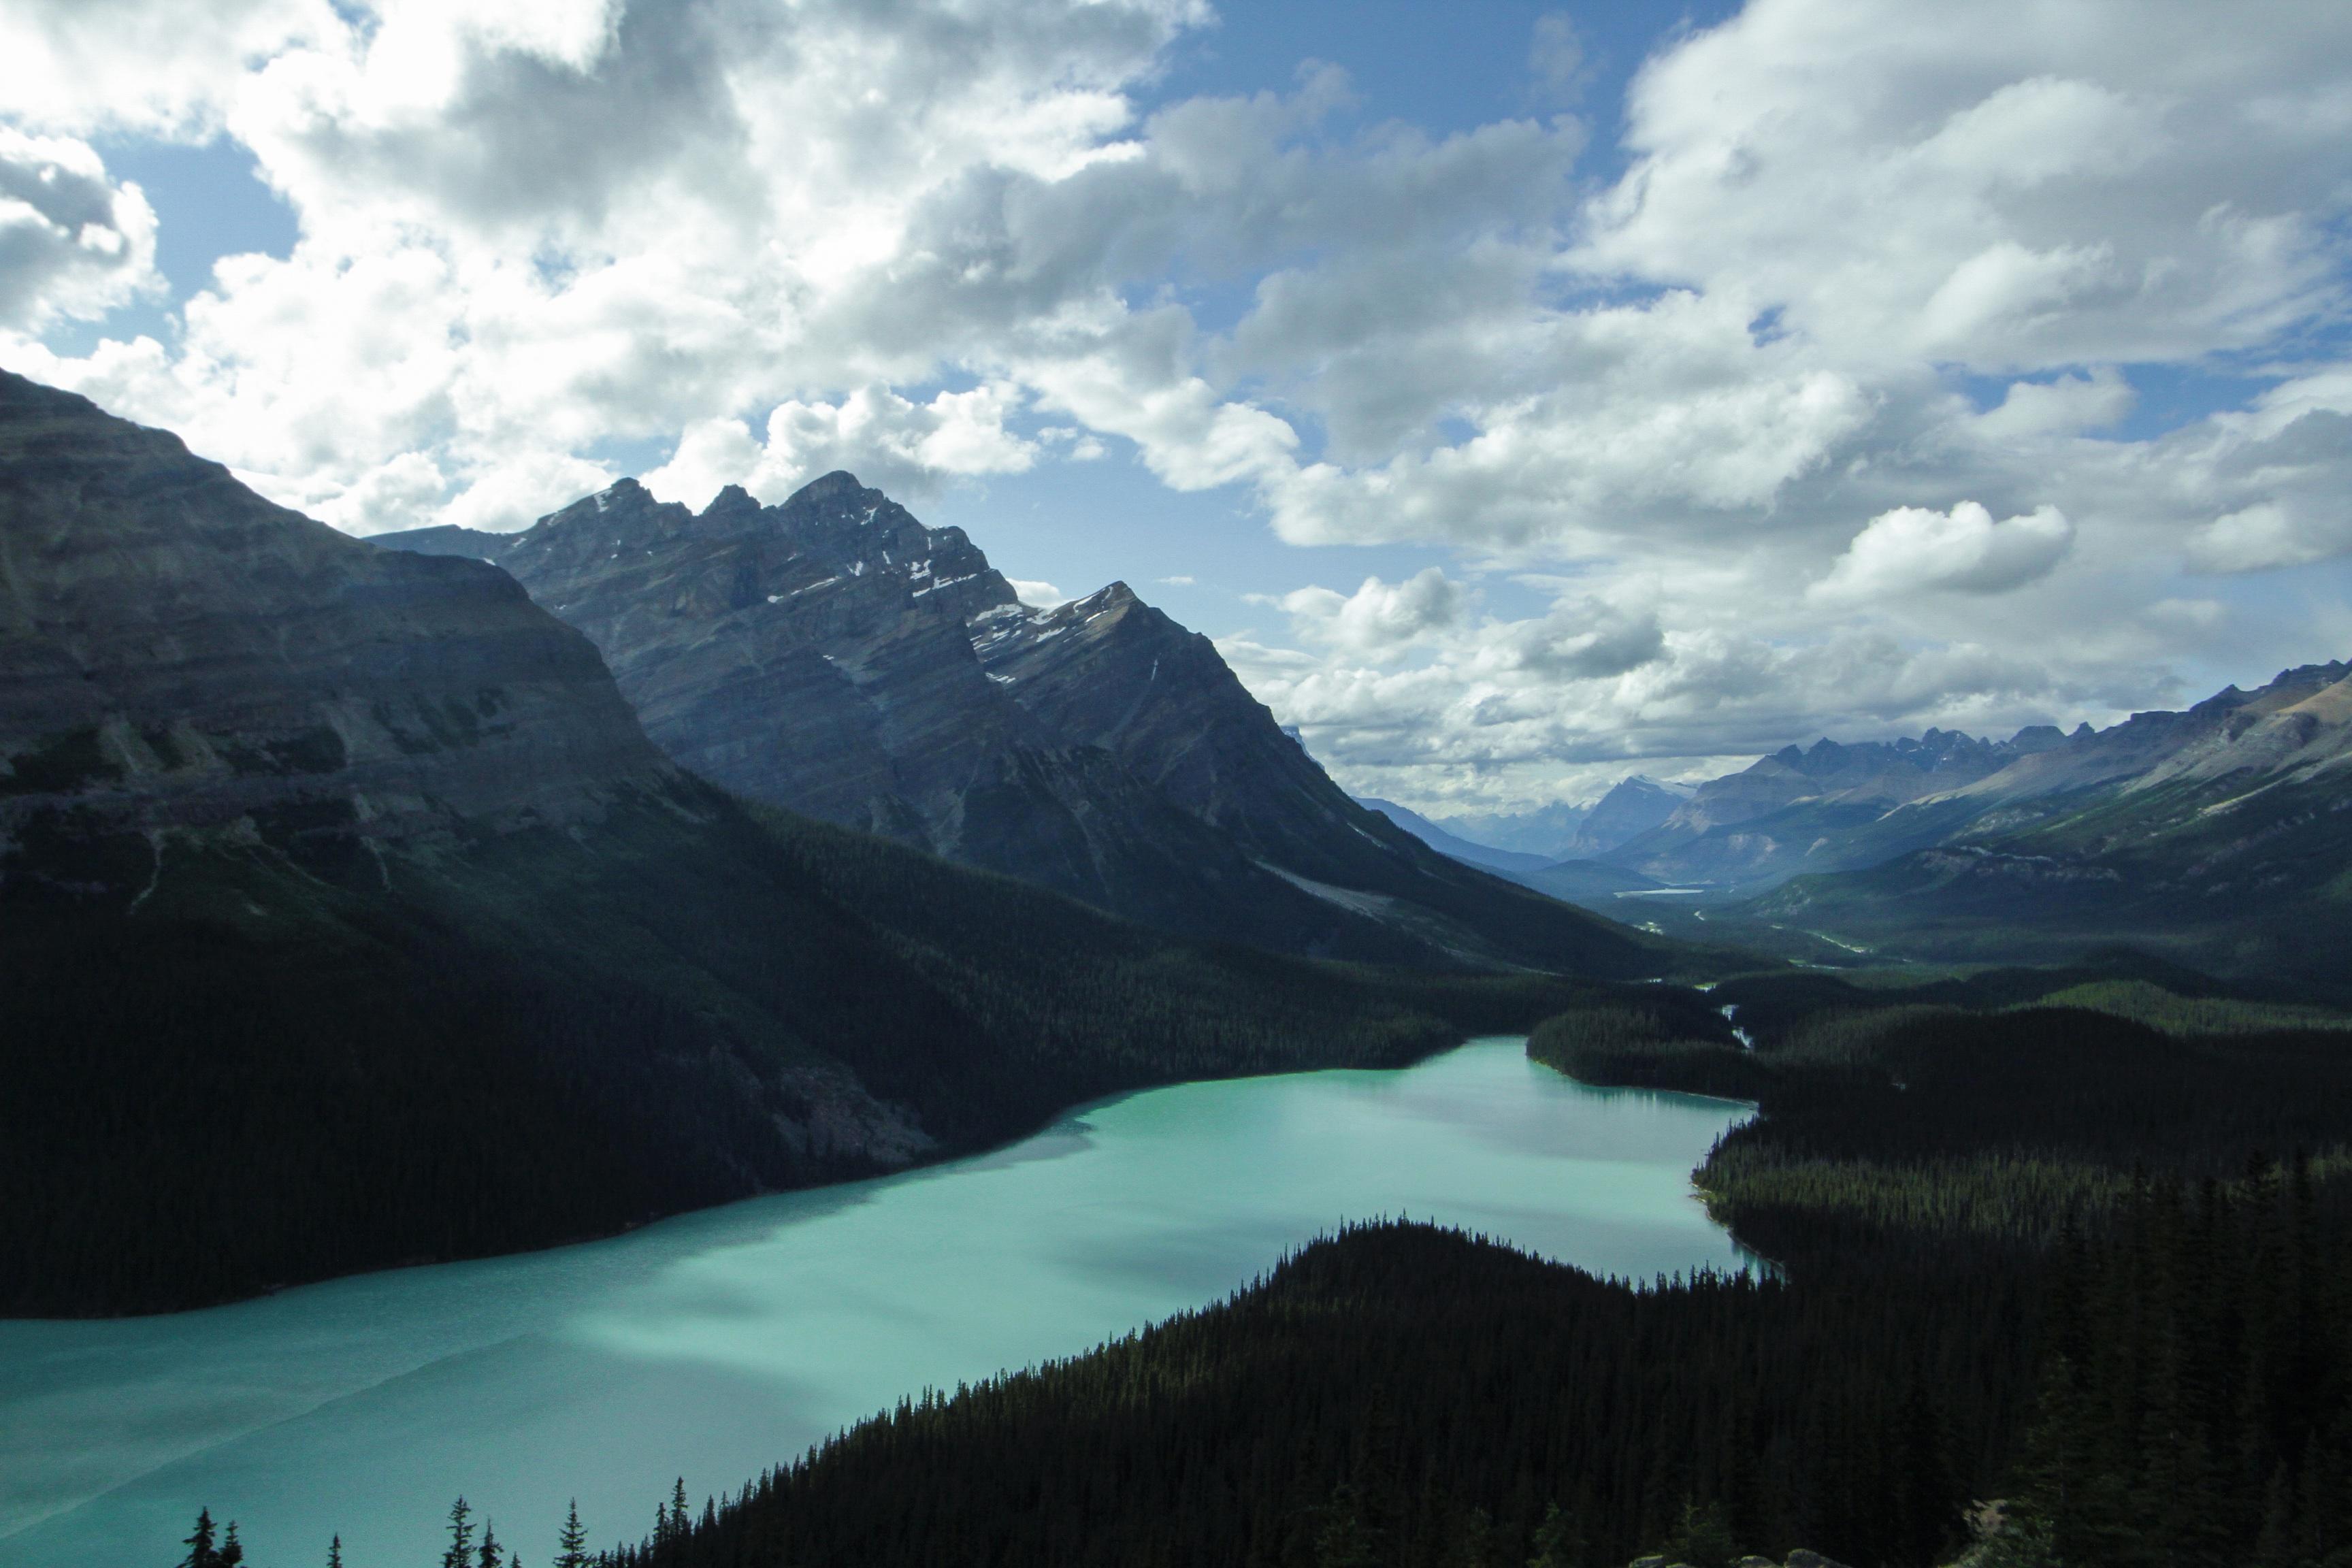 Jasper dating site - free online dating in Jasper (Alberta Canada)